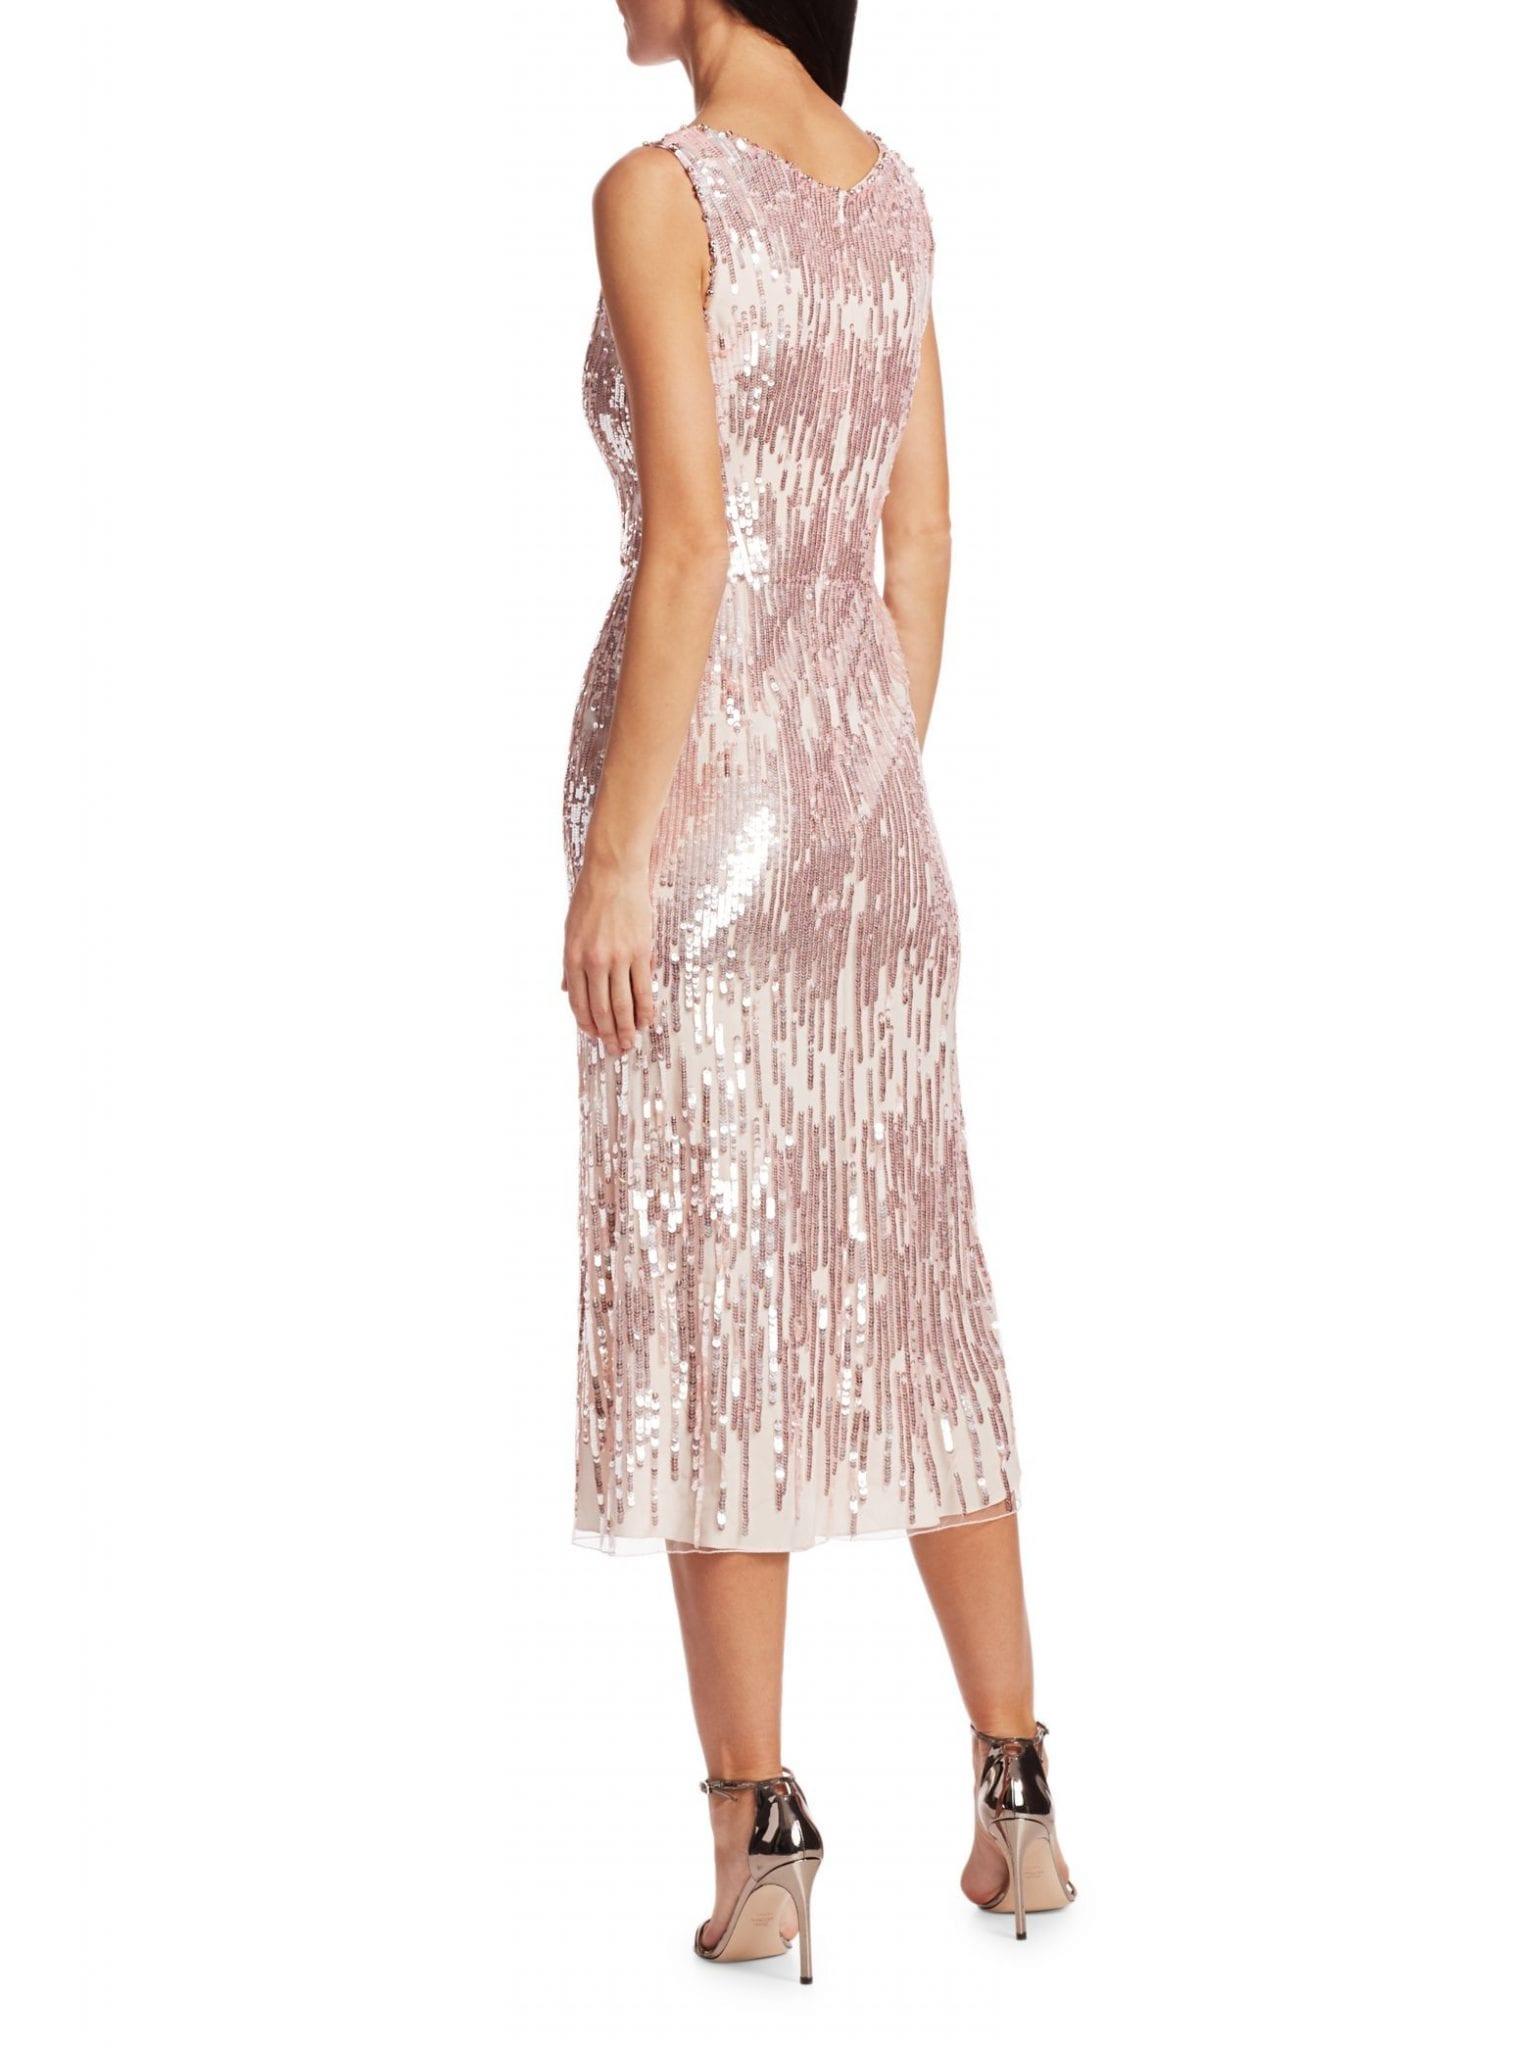 JENNY PACKHAM Sleeveless Sequin Tea Length Dress